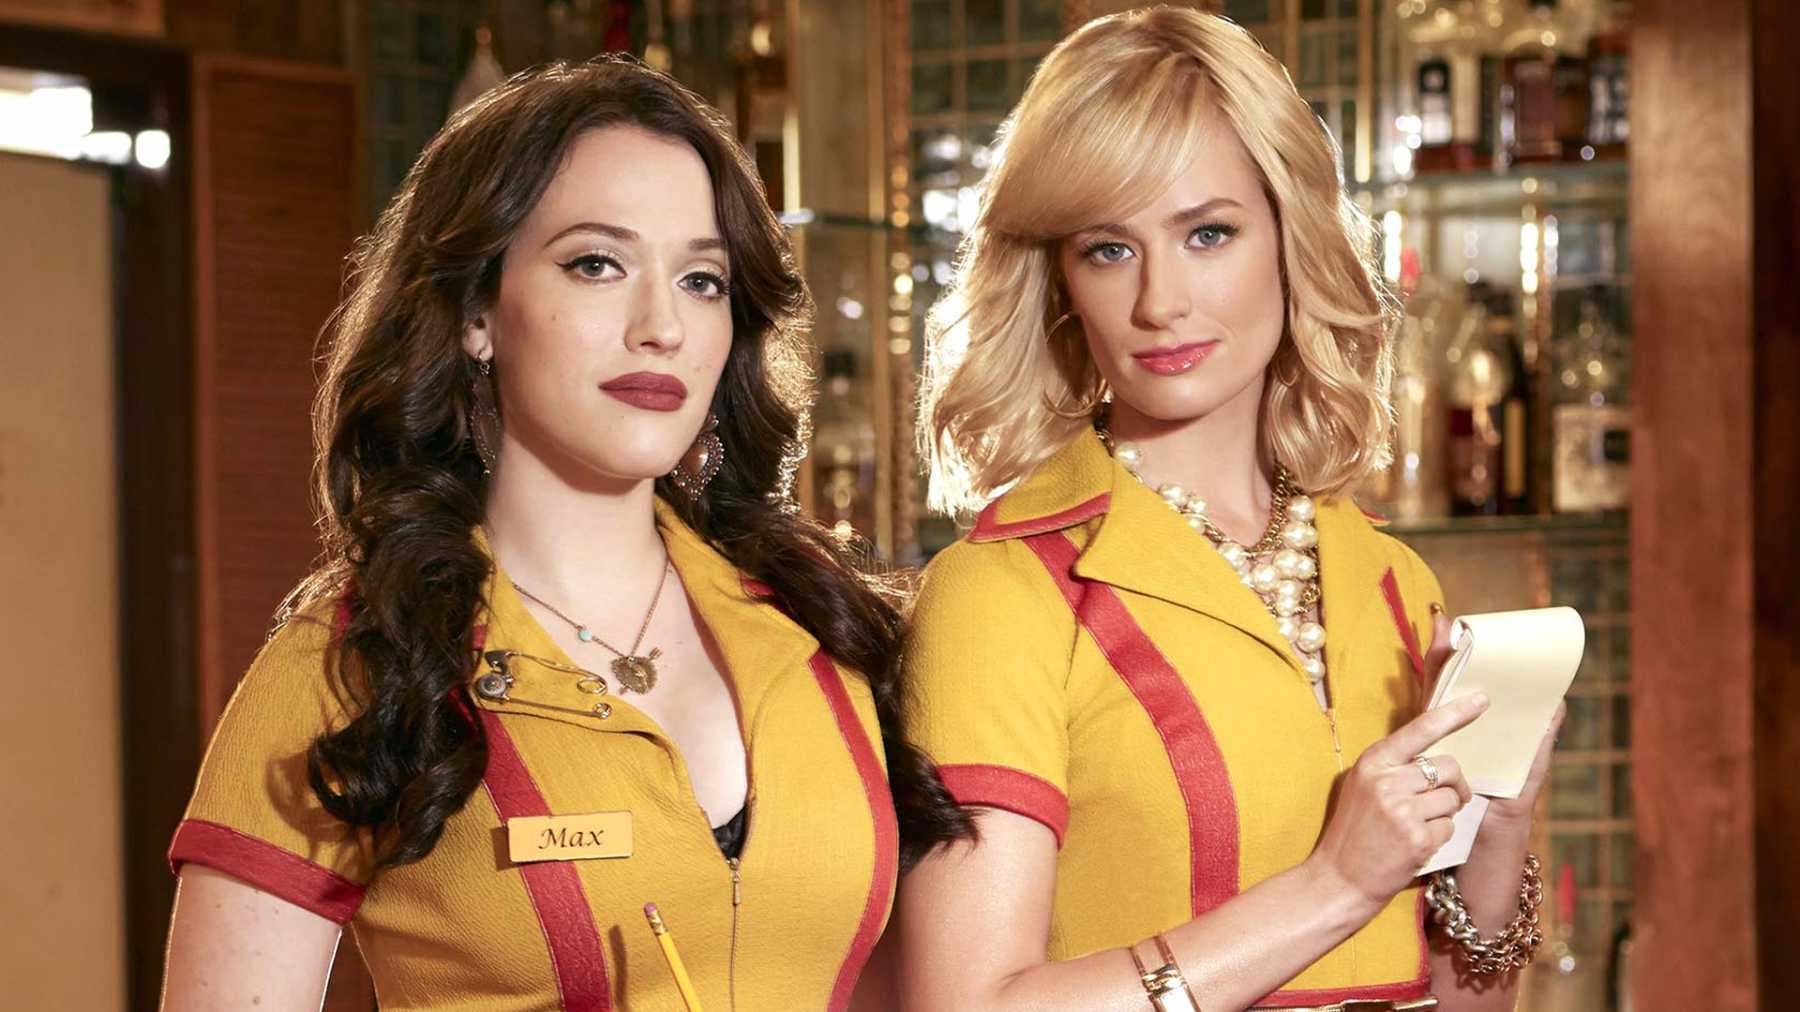 '2 Broke Girls' Cancelled After Six Seasons   2 Broke Girls